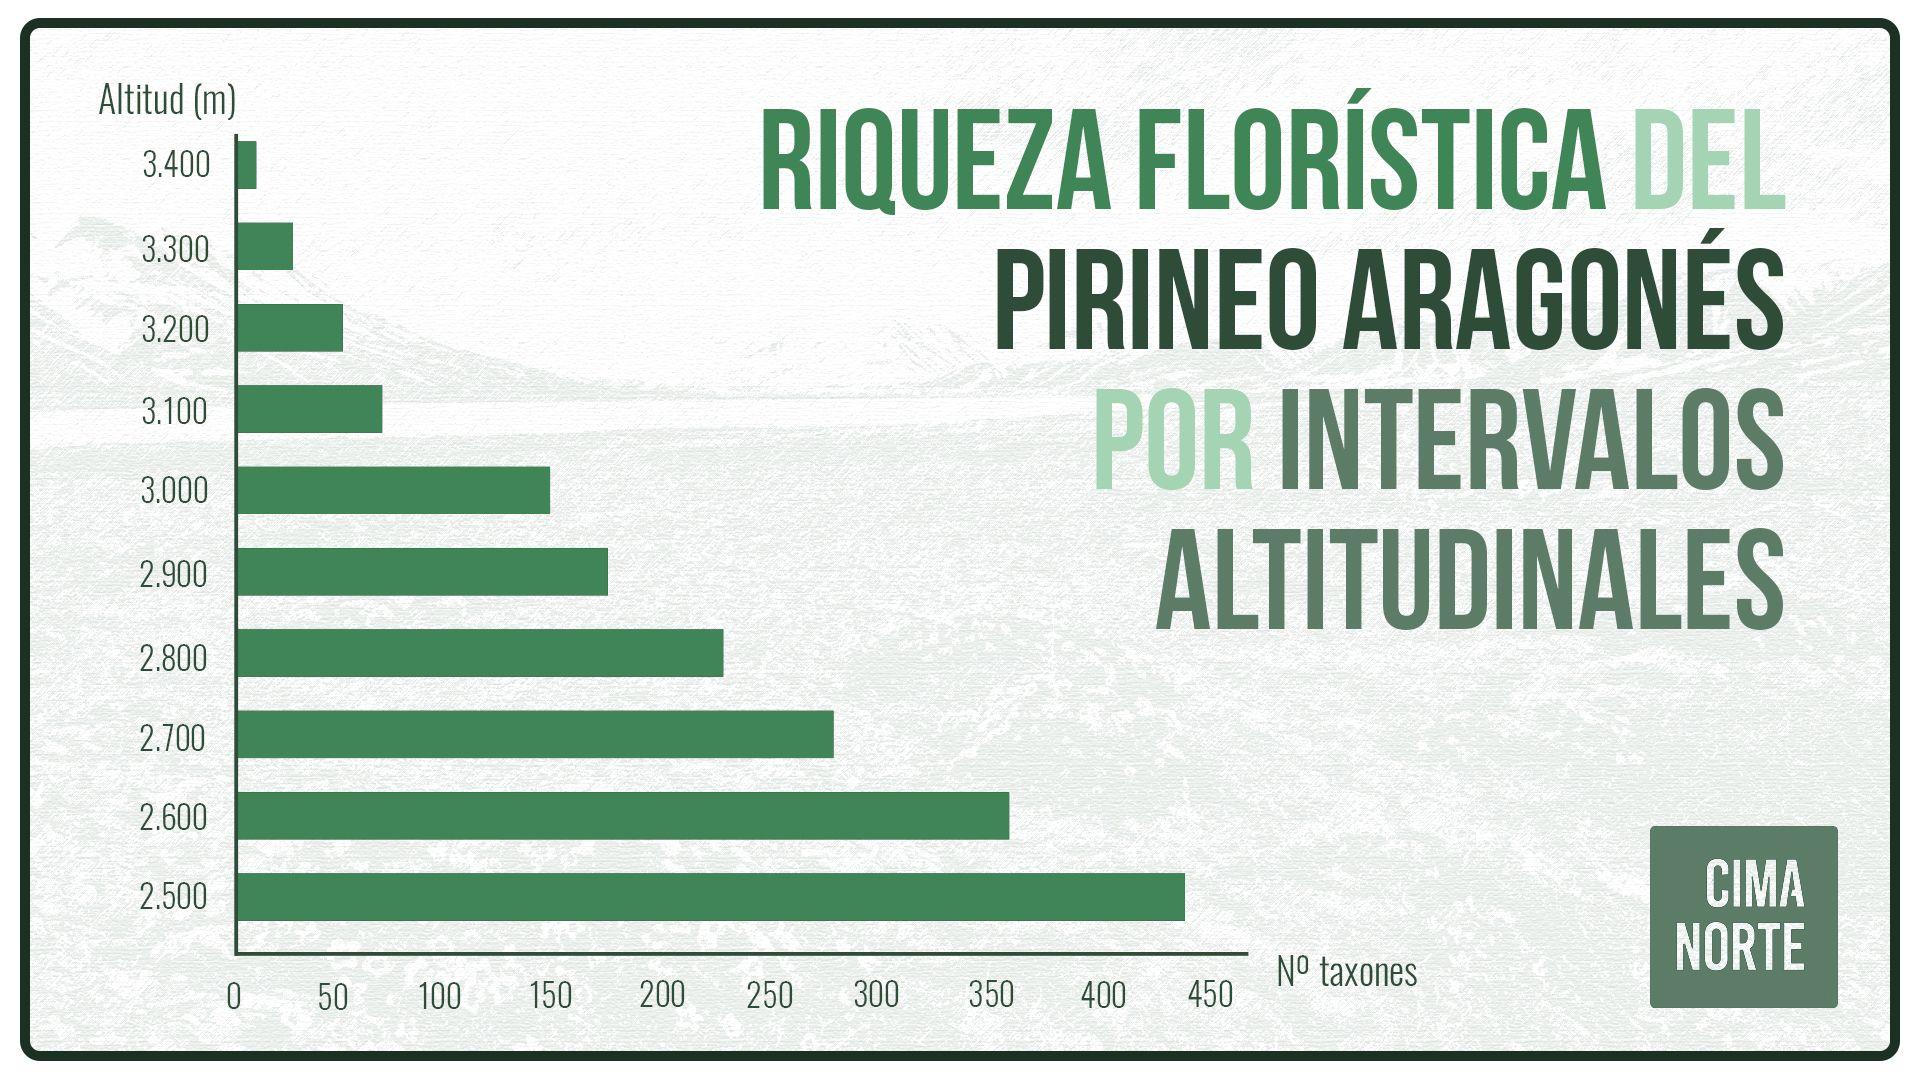 riqueza florística del pirineo aragonés por intervalos altitudinales gráfica infografia flora plantas